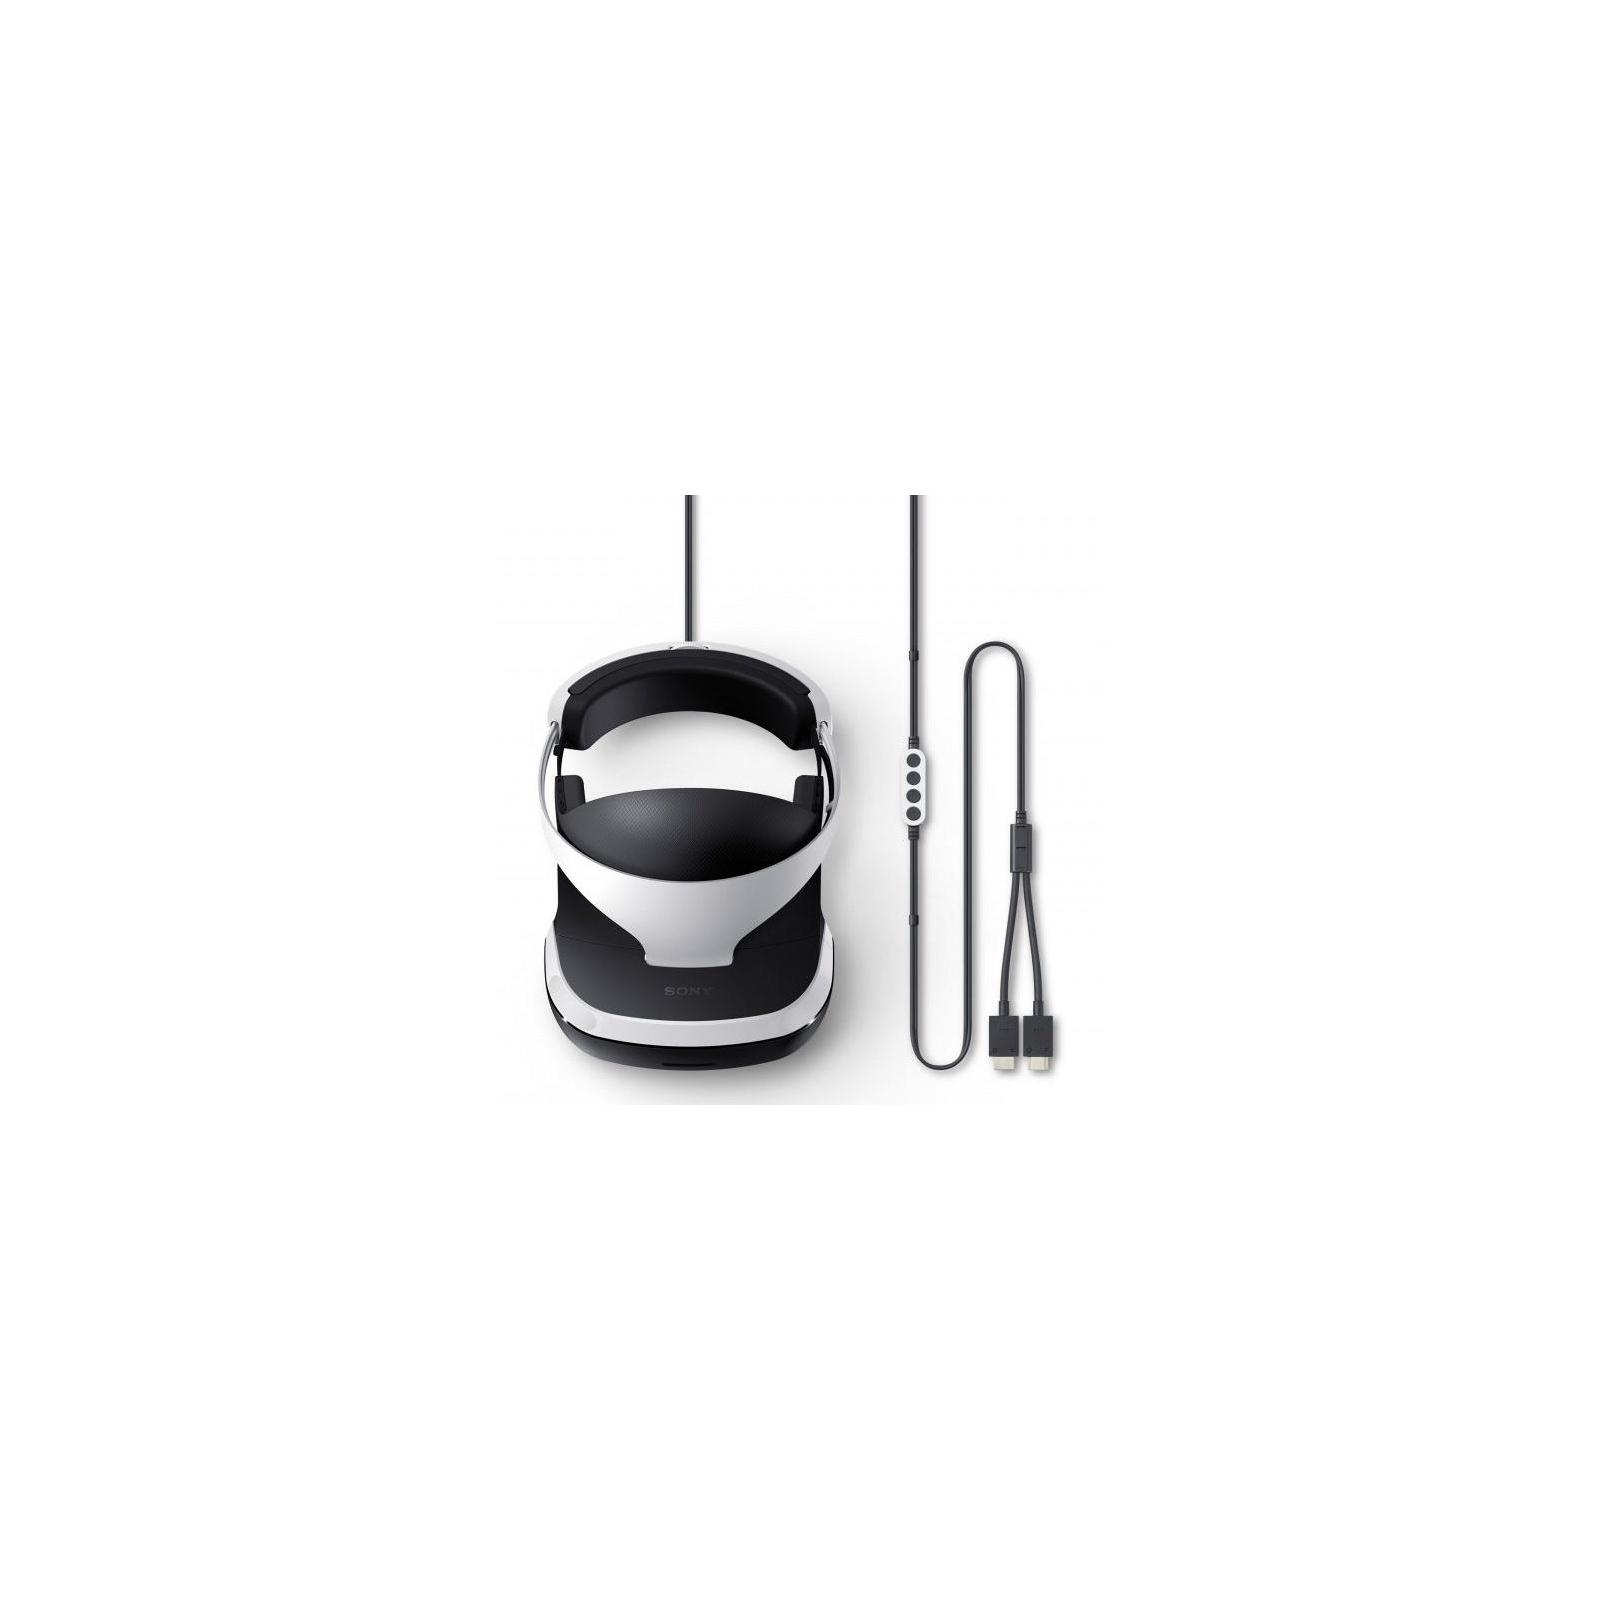 Окуляри віртуальної реальності SONY PlayStation VR (Camera +GTSport +VR  Worlds) зображення 4 8abef59401376